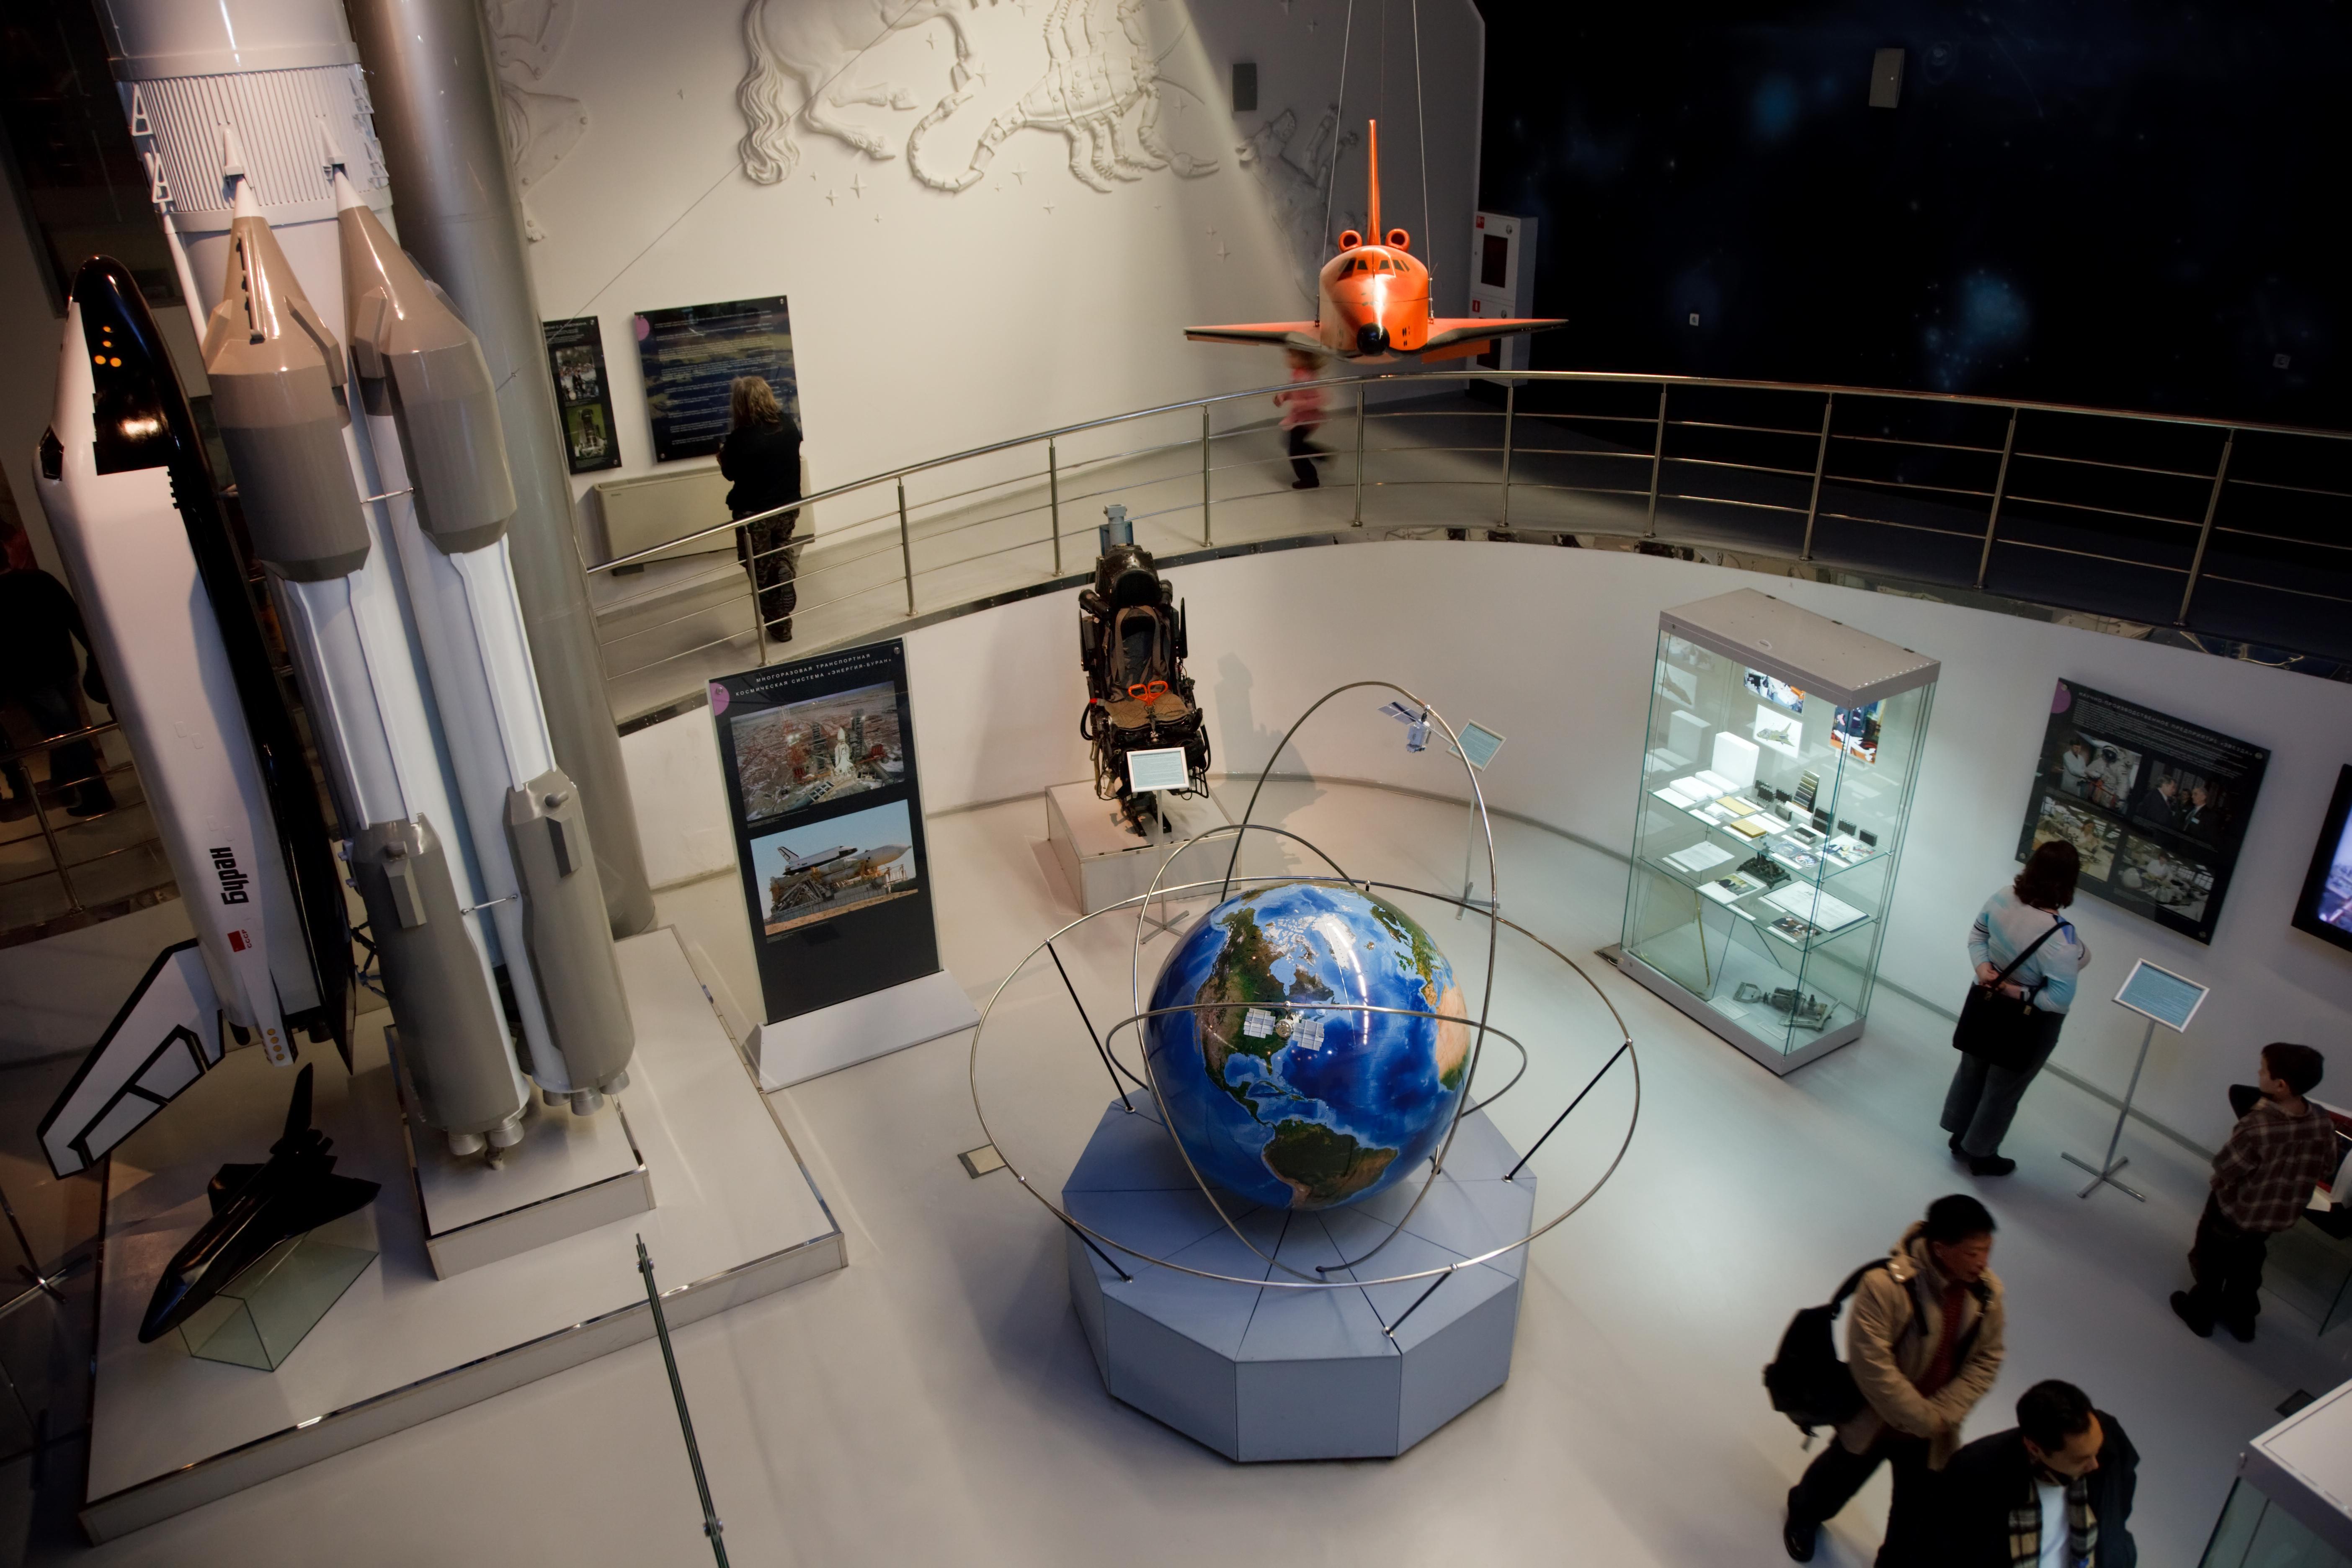 Soviet space displays